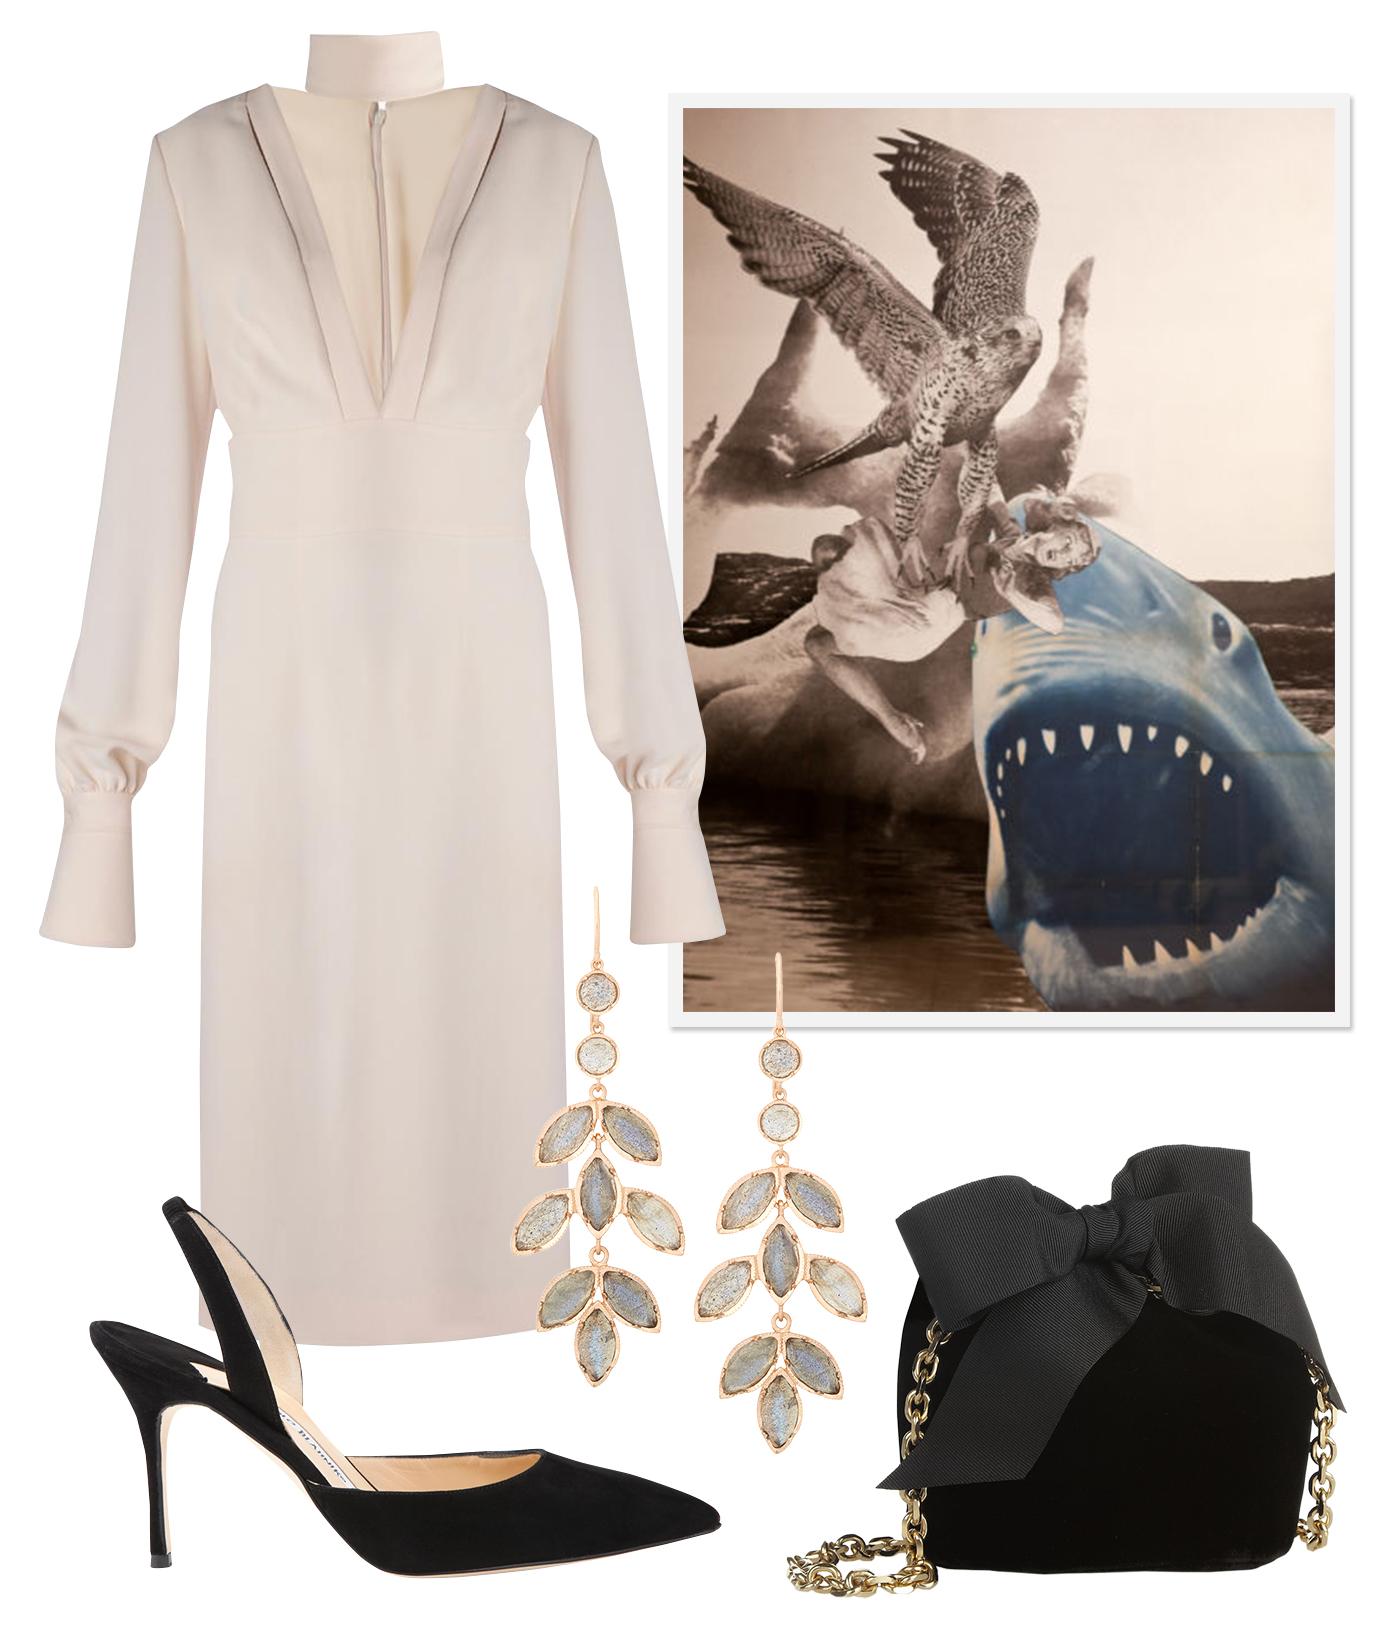 art-basel-outfit-ideas_01.jpg